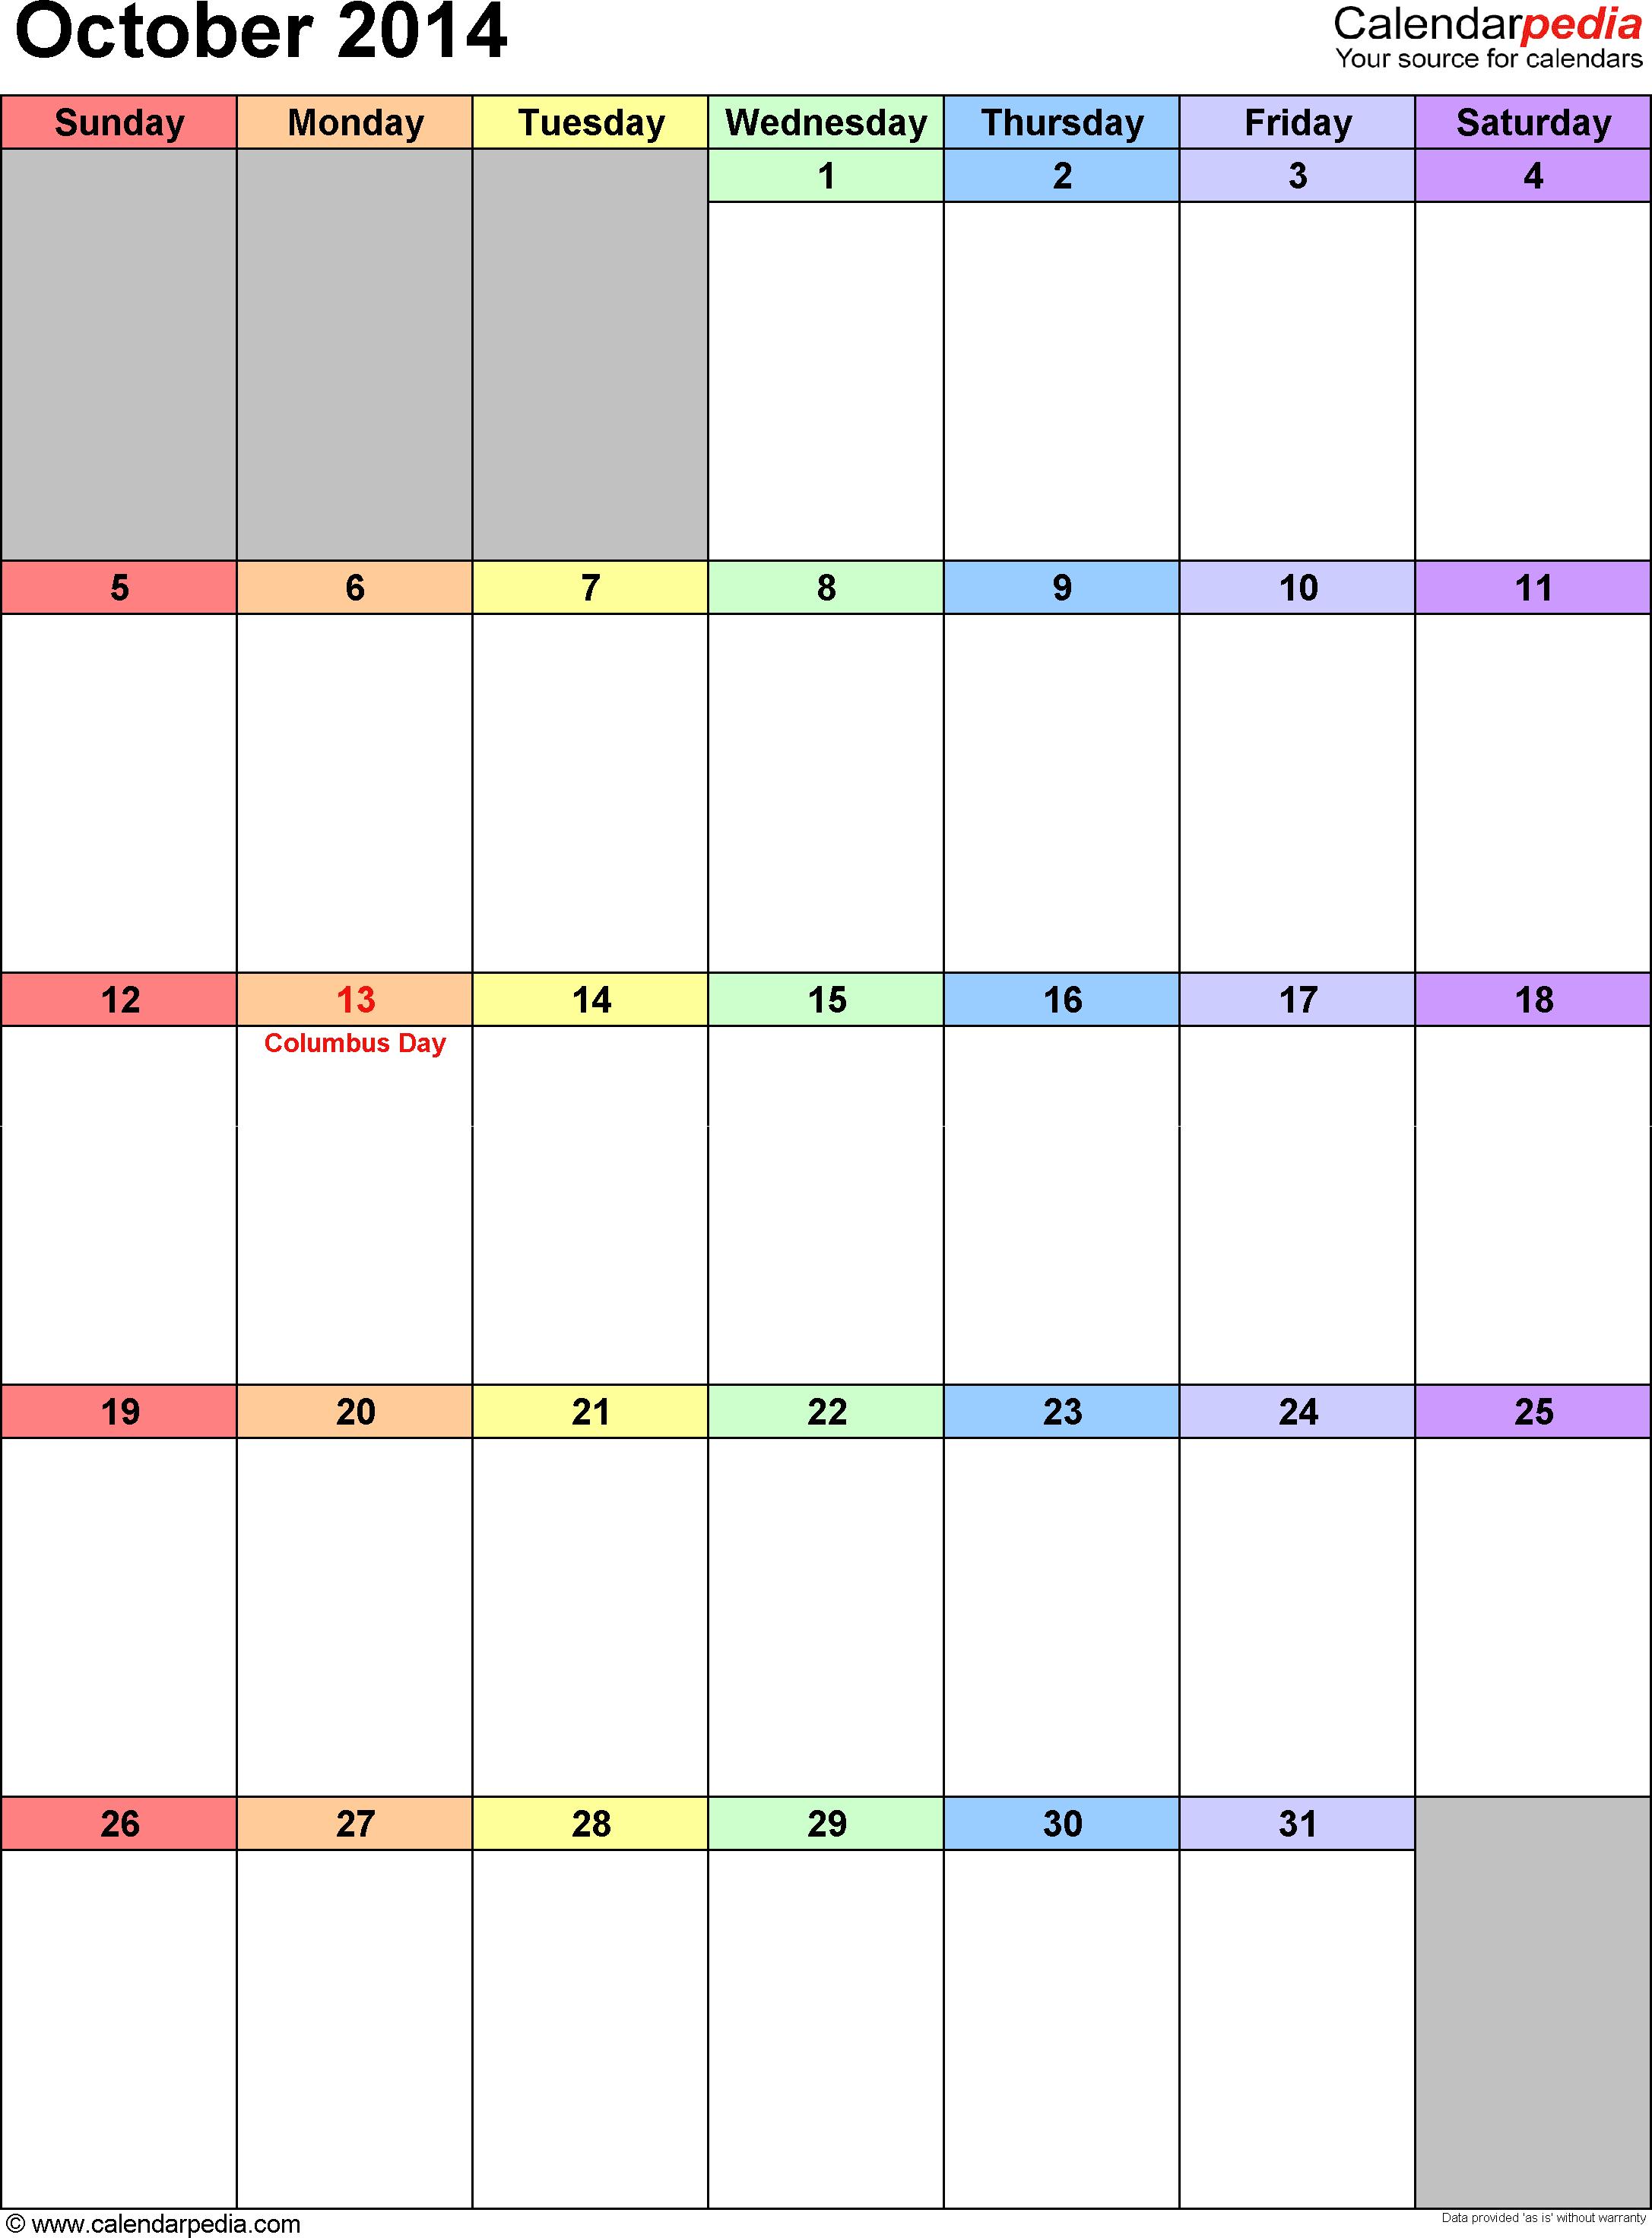 October 2014 calendar, portrait orientation, 'rainbow calendar', available as printable templates for Word, Excel and PDF